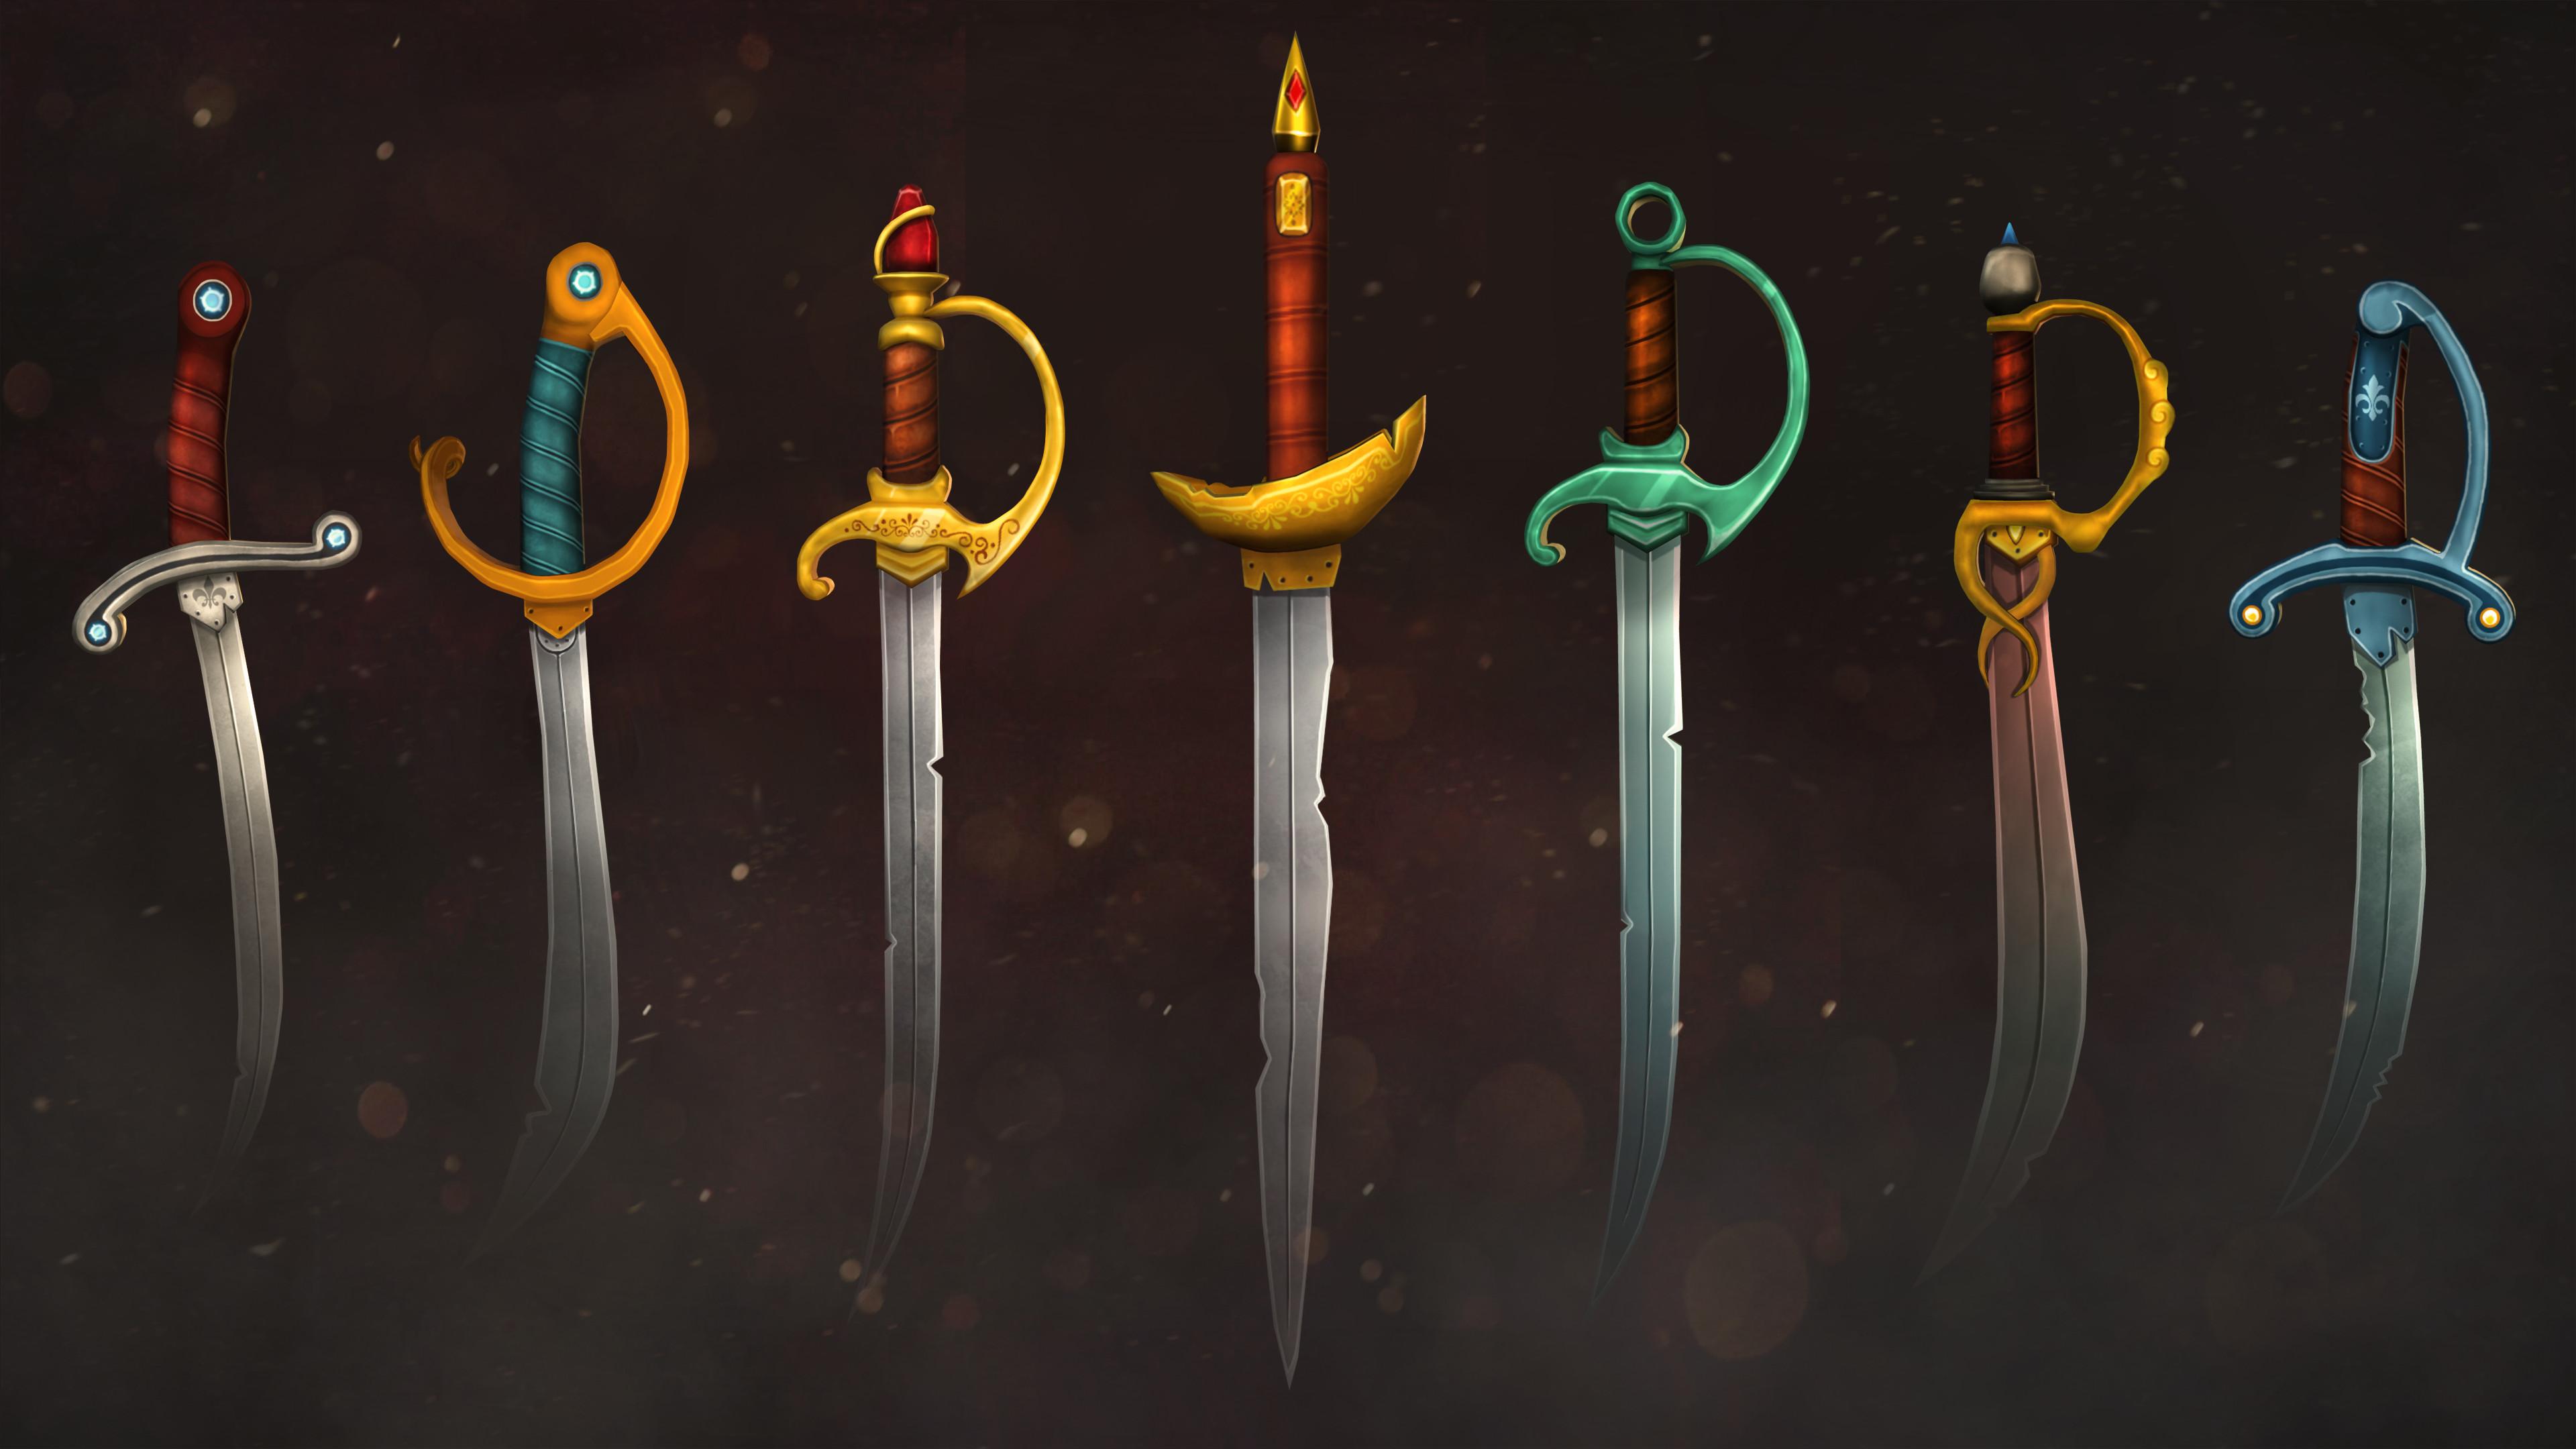 Sword assets